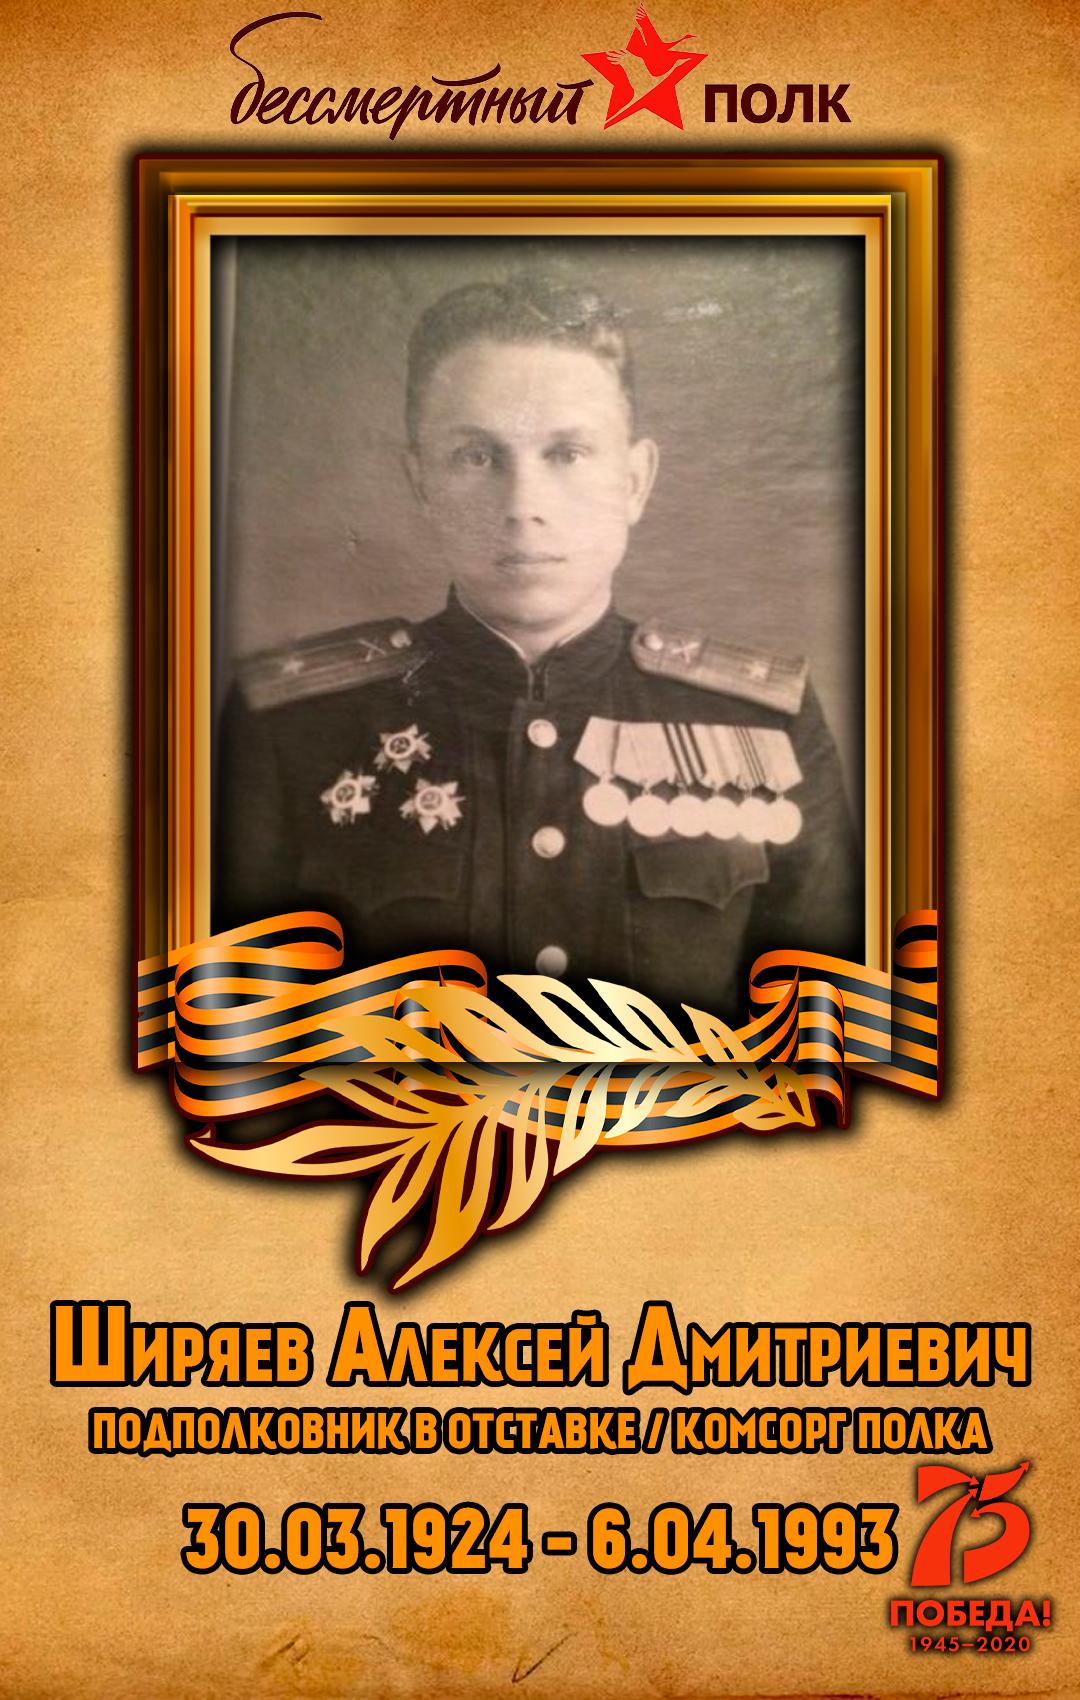 Ширяев-Алексей-Дмитриевич